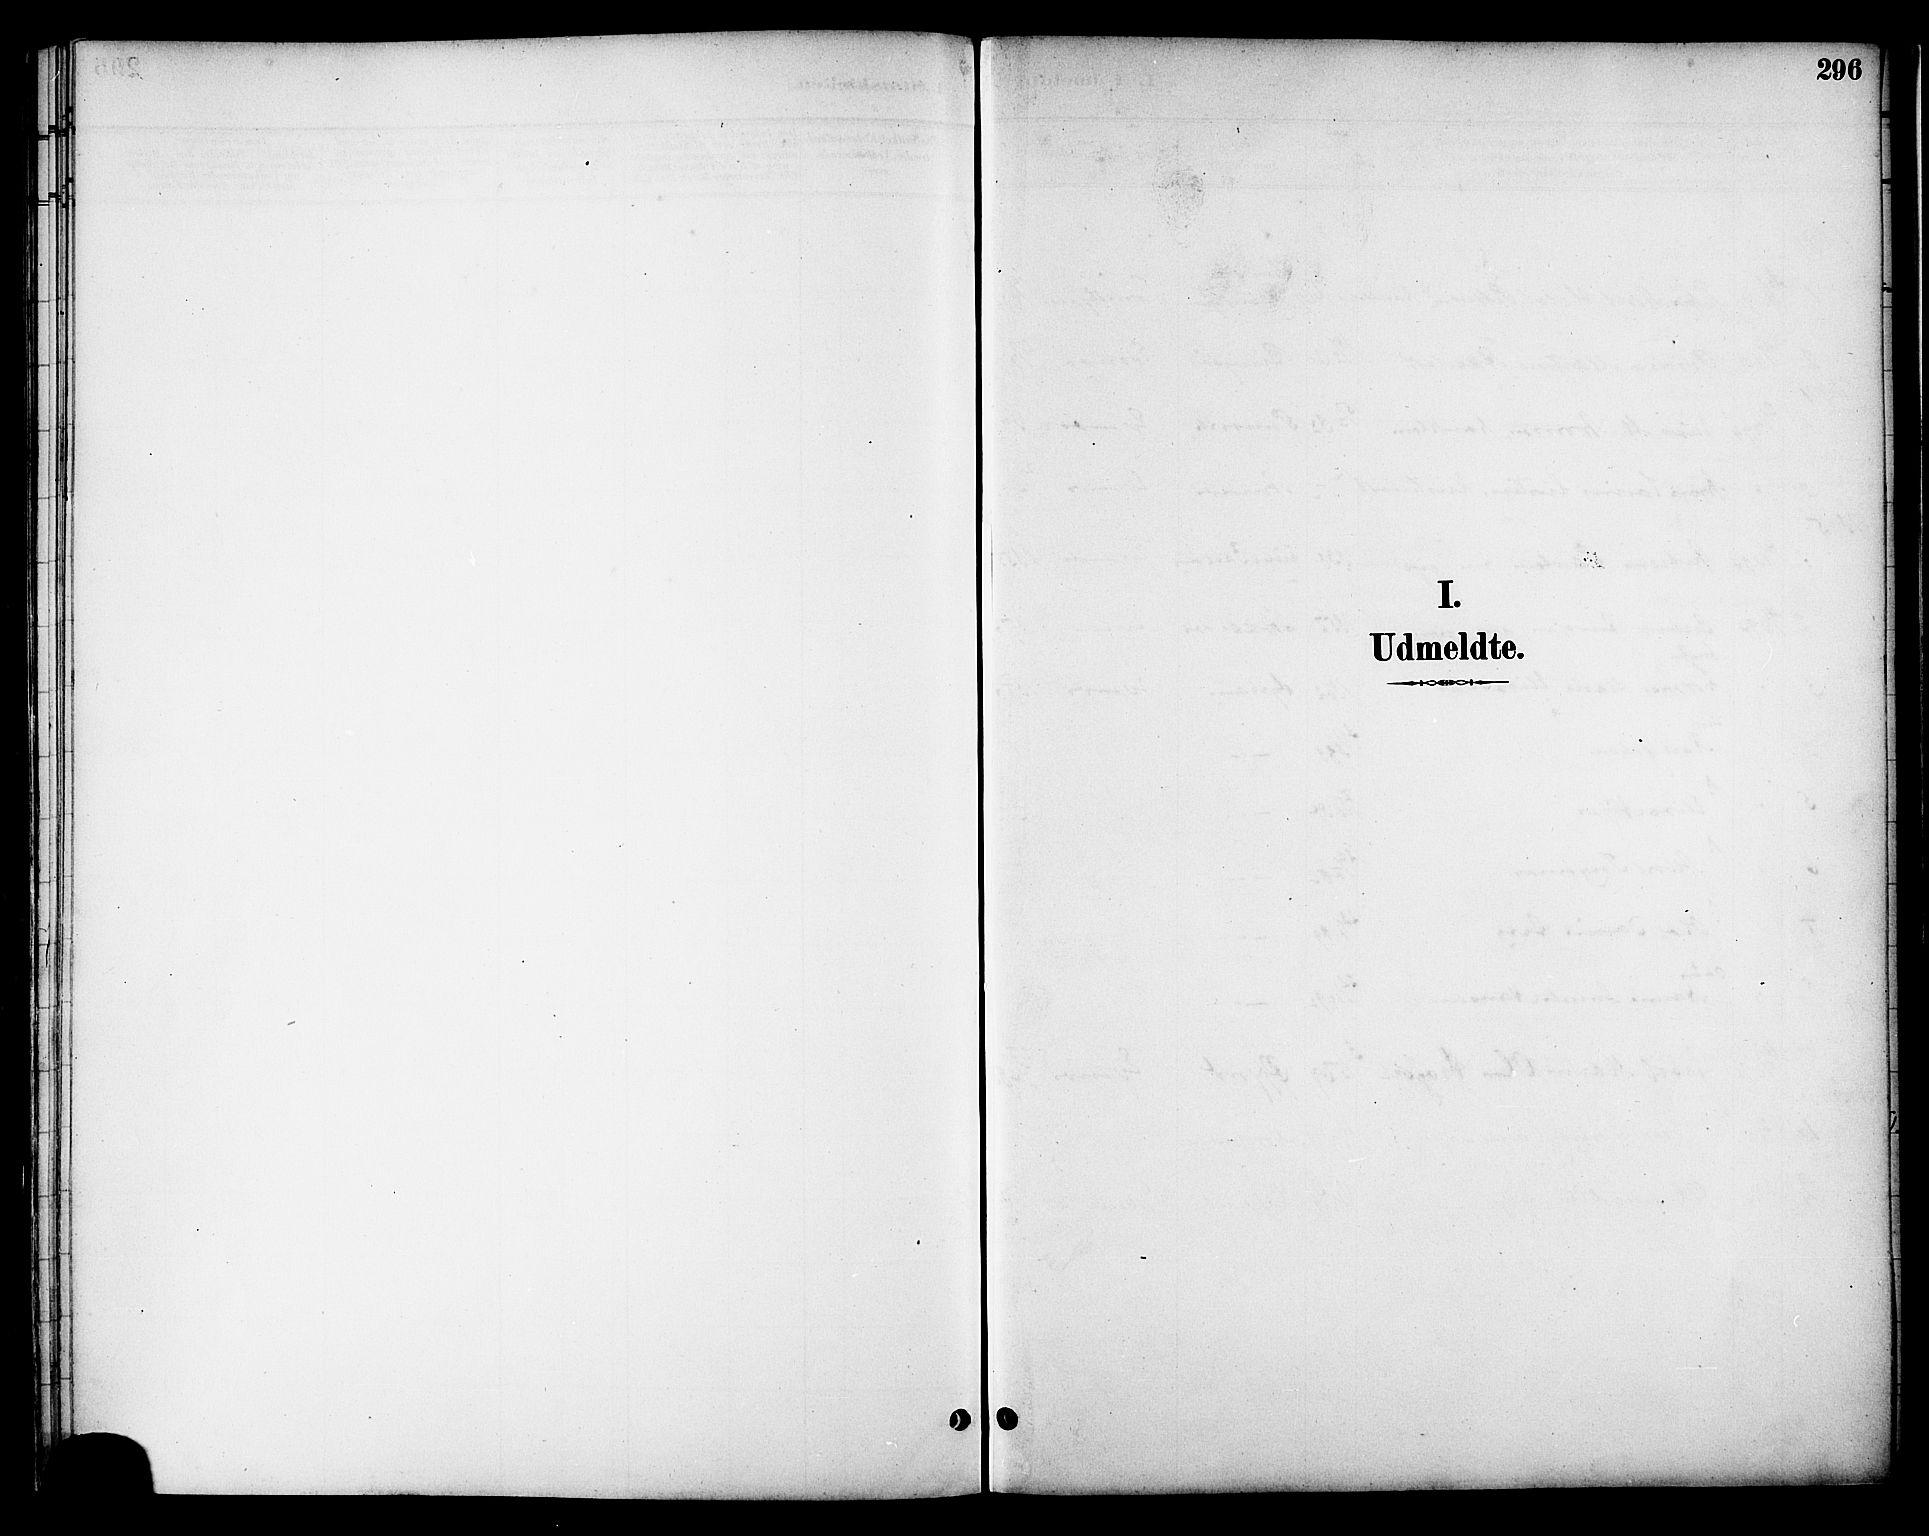 SAT, Ministerialprotokoller, klokkerbøker og fødselsregistre - Nordland, 863/L0898: Ministerialbok nr. 863A10, 1886-1897, s. 296